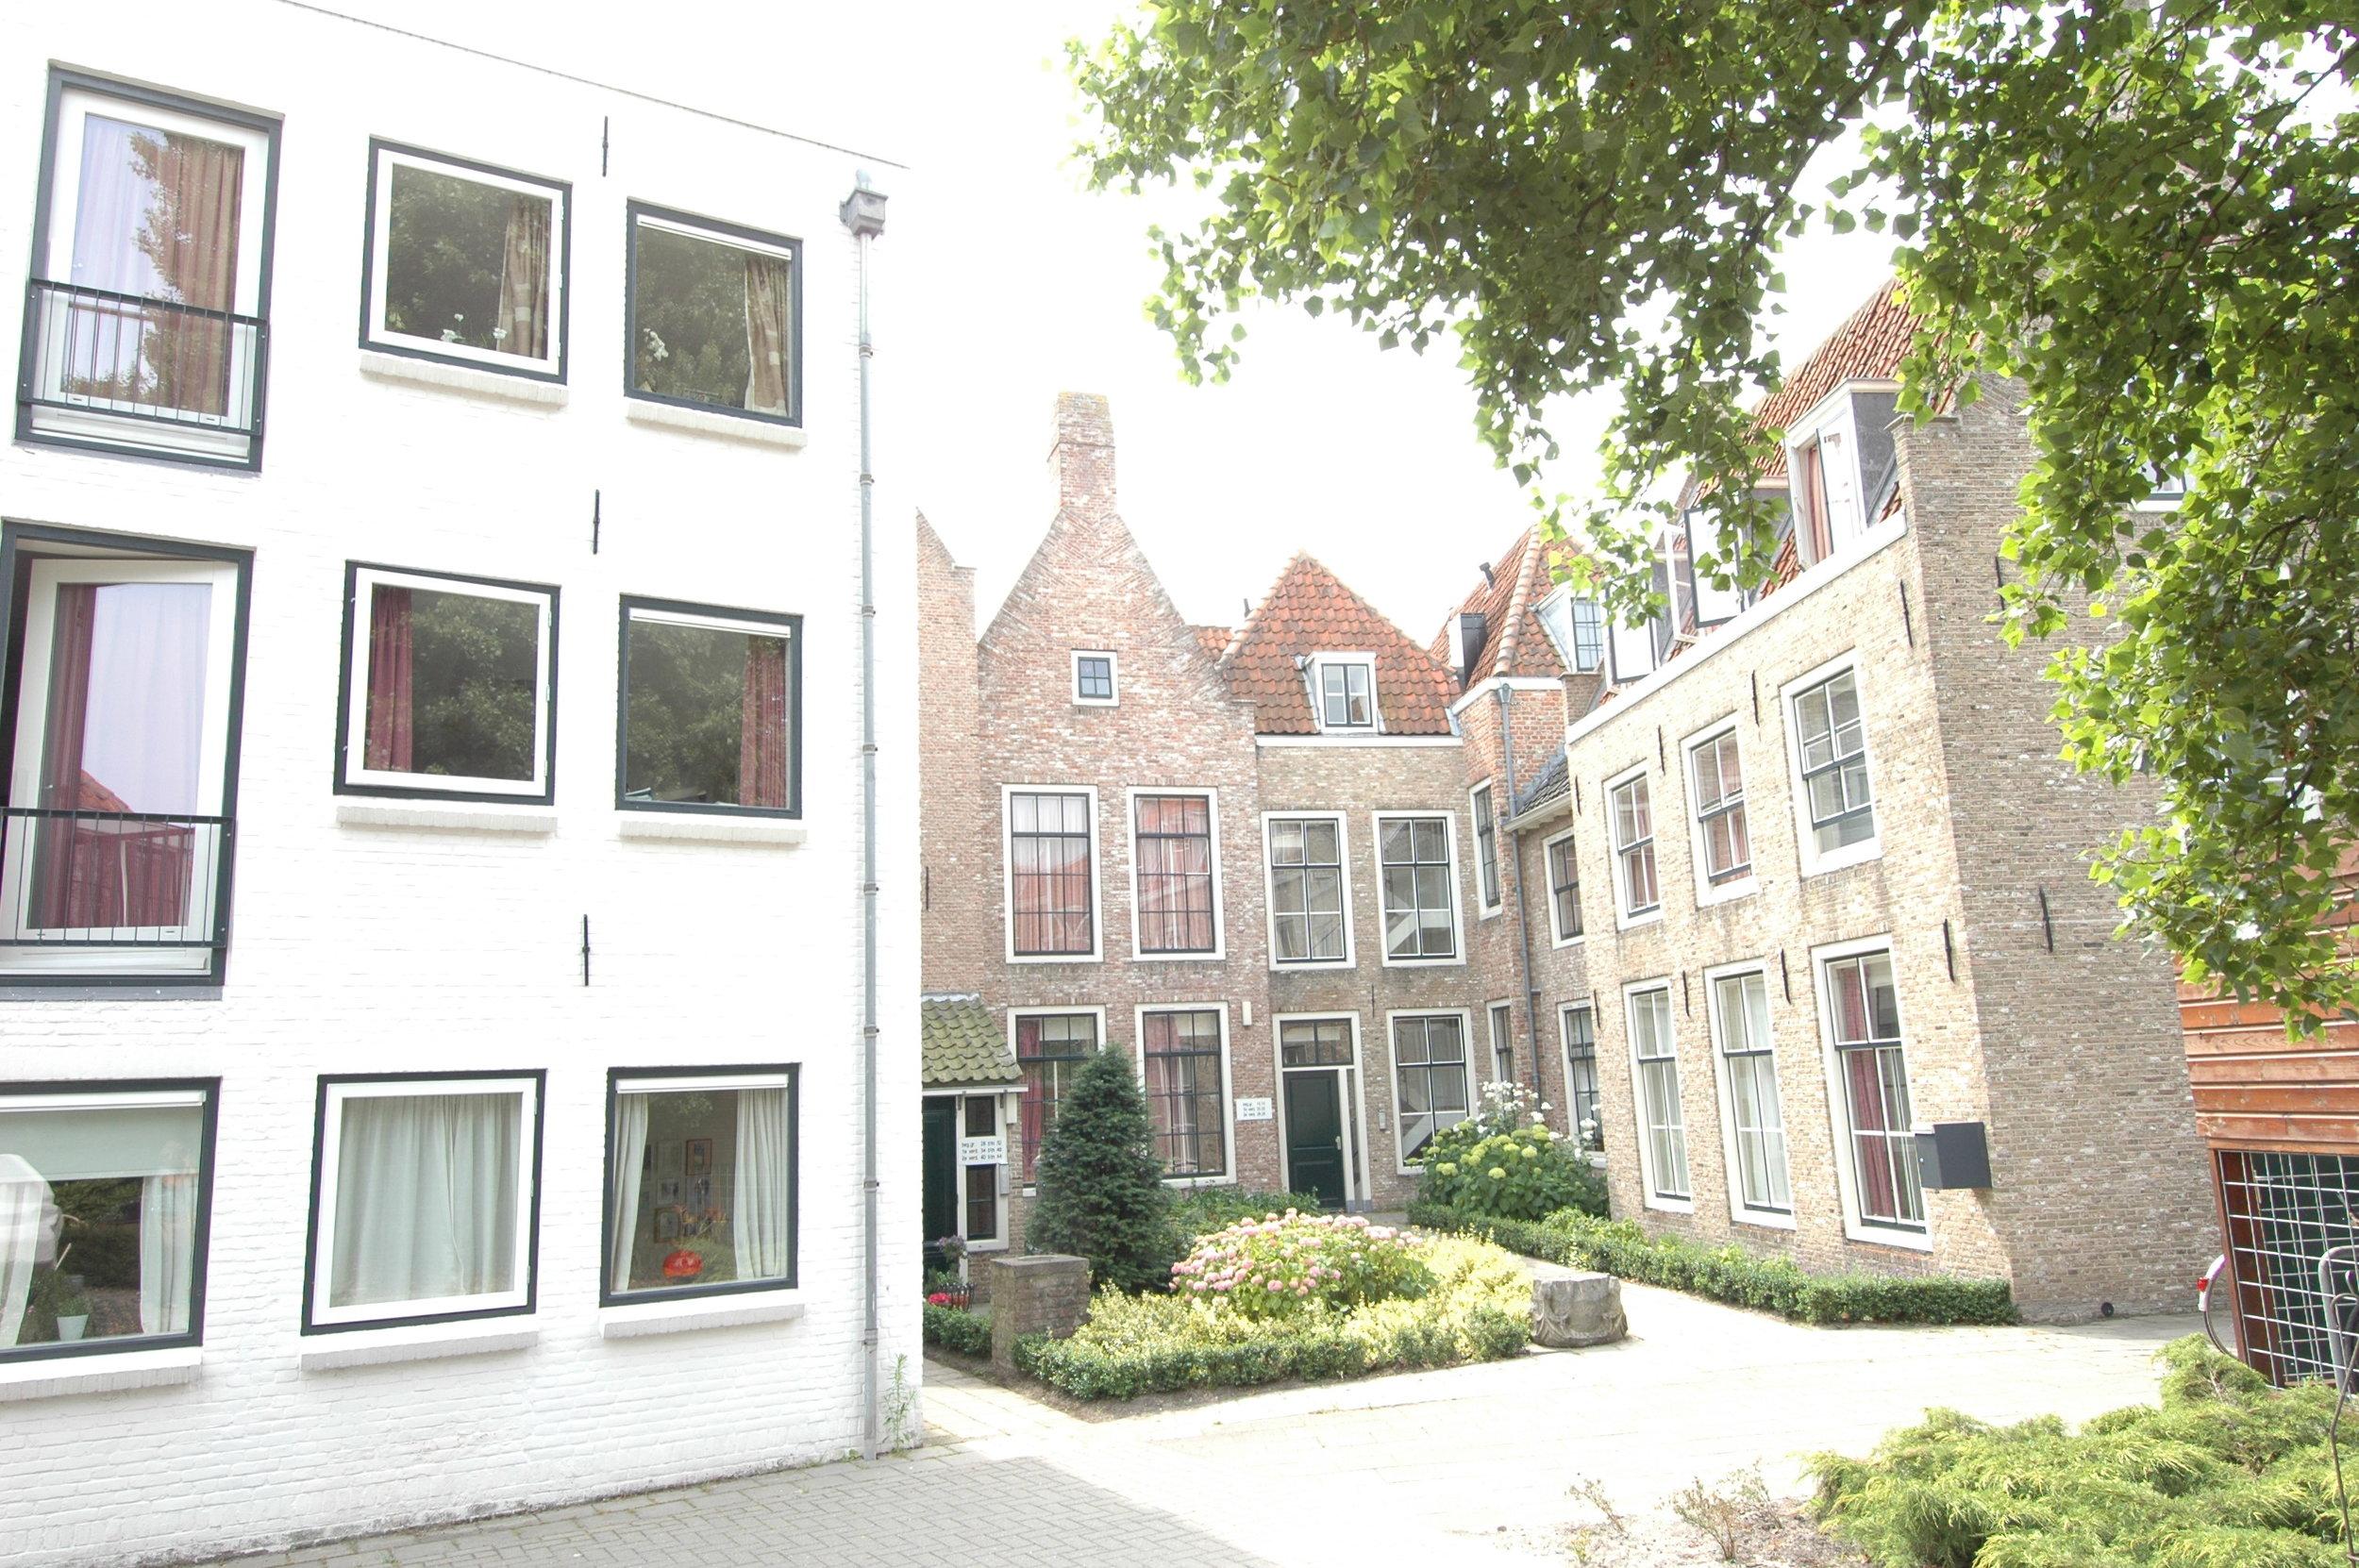 Middelburg 046.jpg